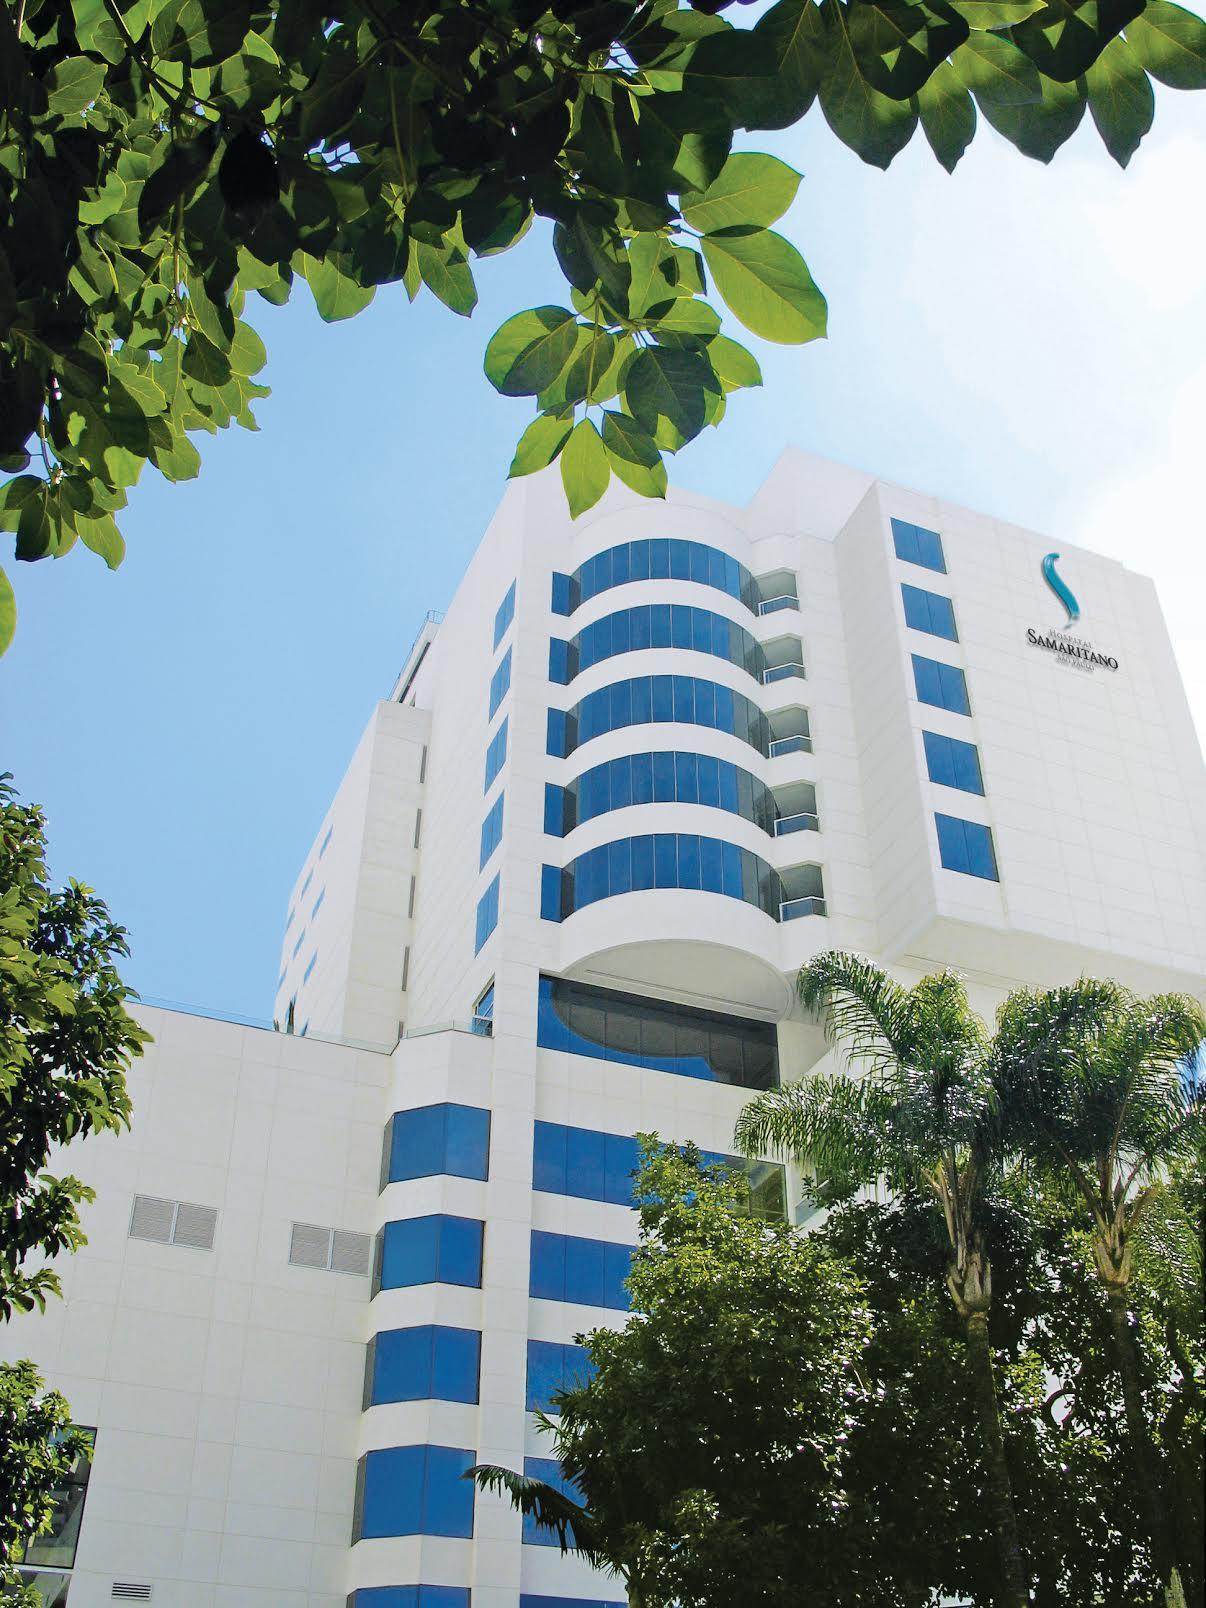 Hospital Samaritano - External view